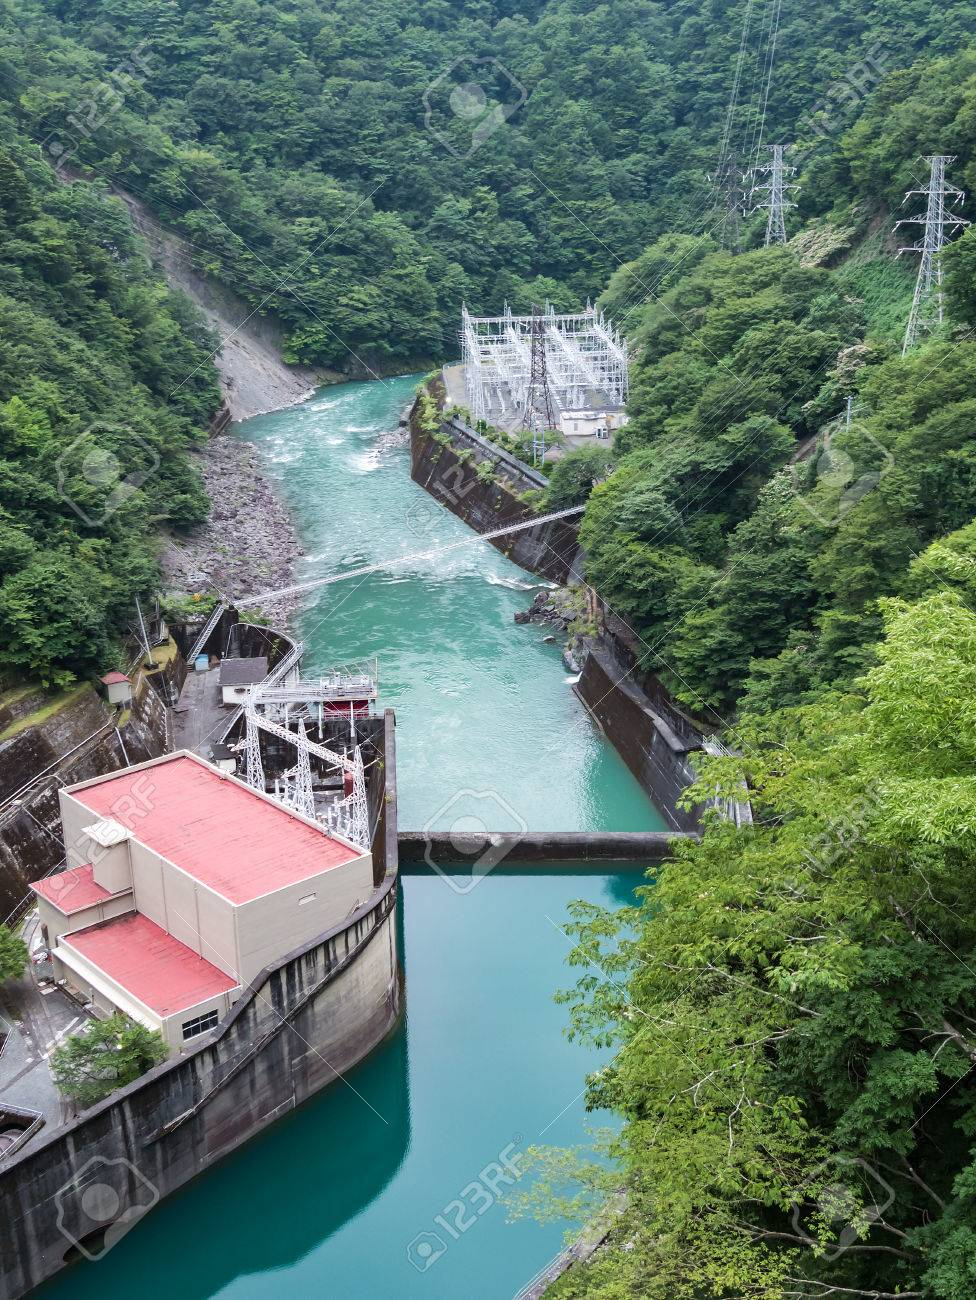 Hydroelectric Power Plant Japan Worksheet And Wiring Diagram Mini Hydro Landscape Of Iawa River In Shizuoka Rh 123rf Com